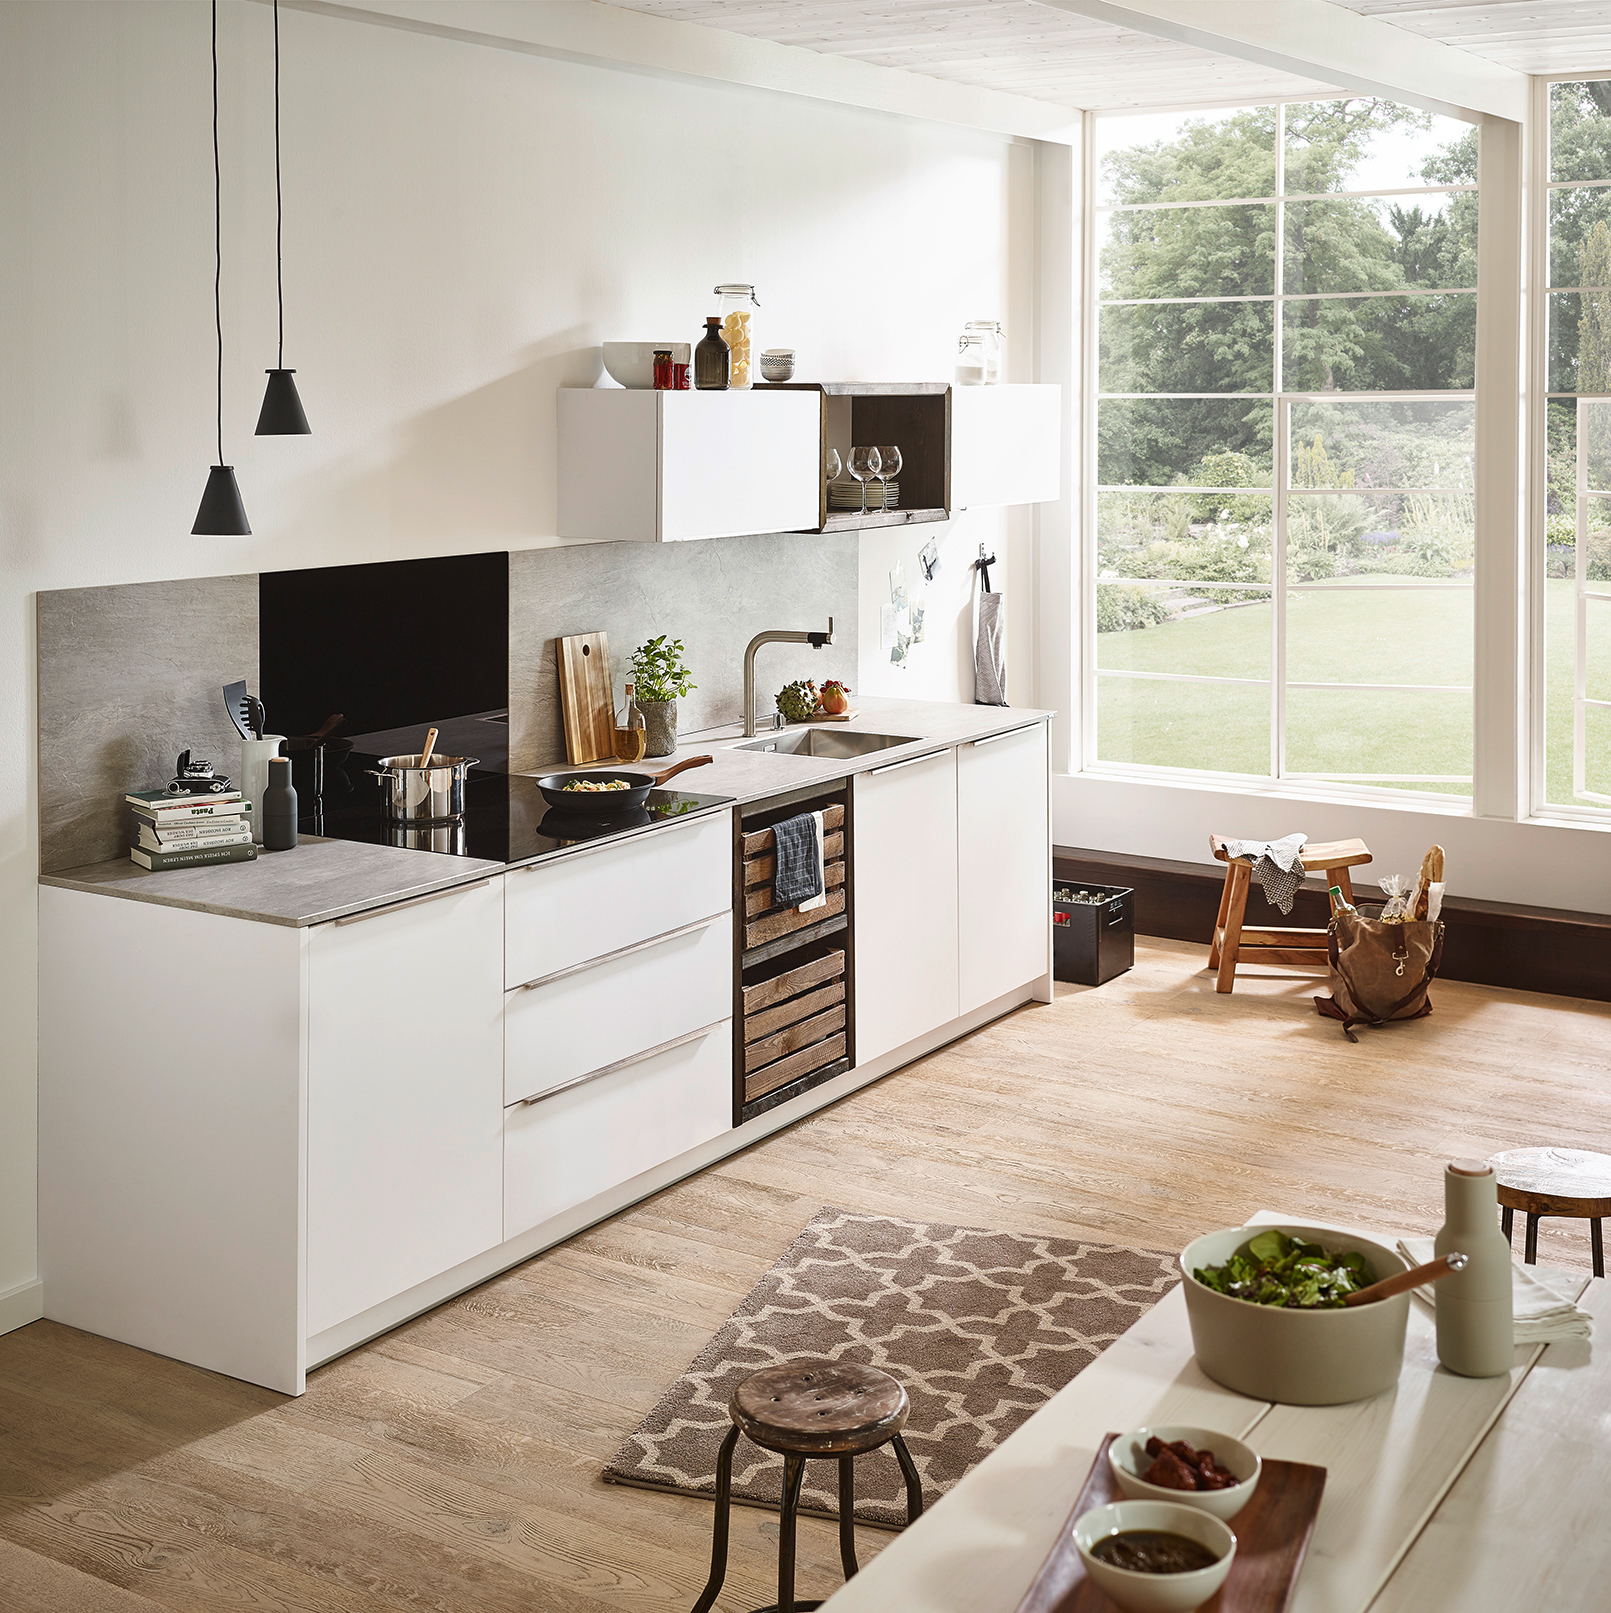 Gut bekannt Küchenrückwand: Holz, Glas oder Metall? UW22